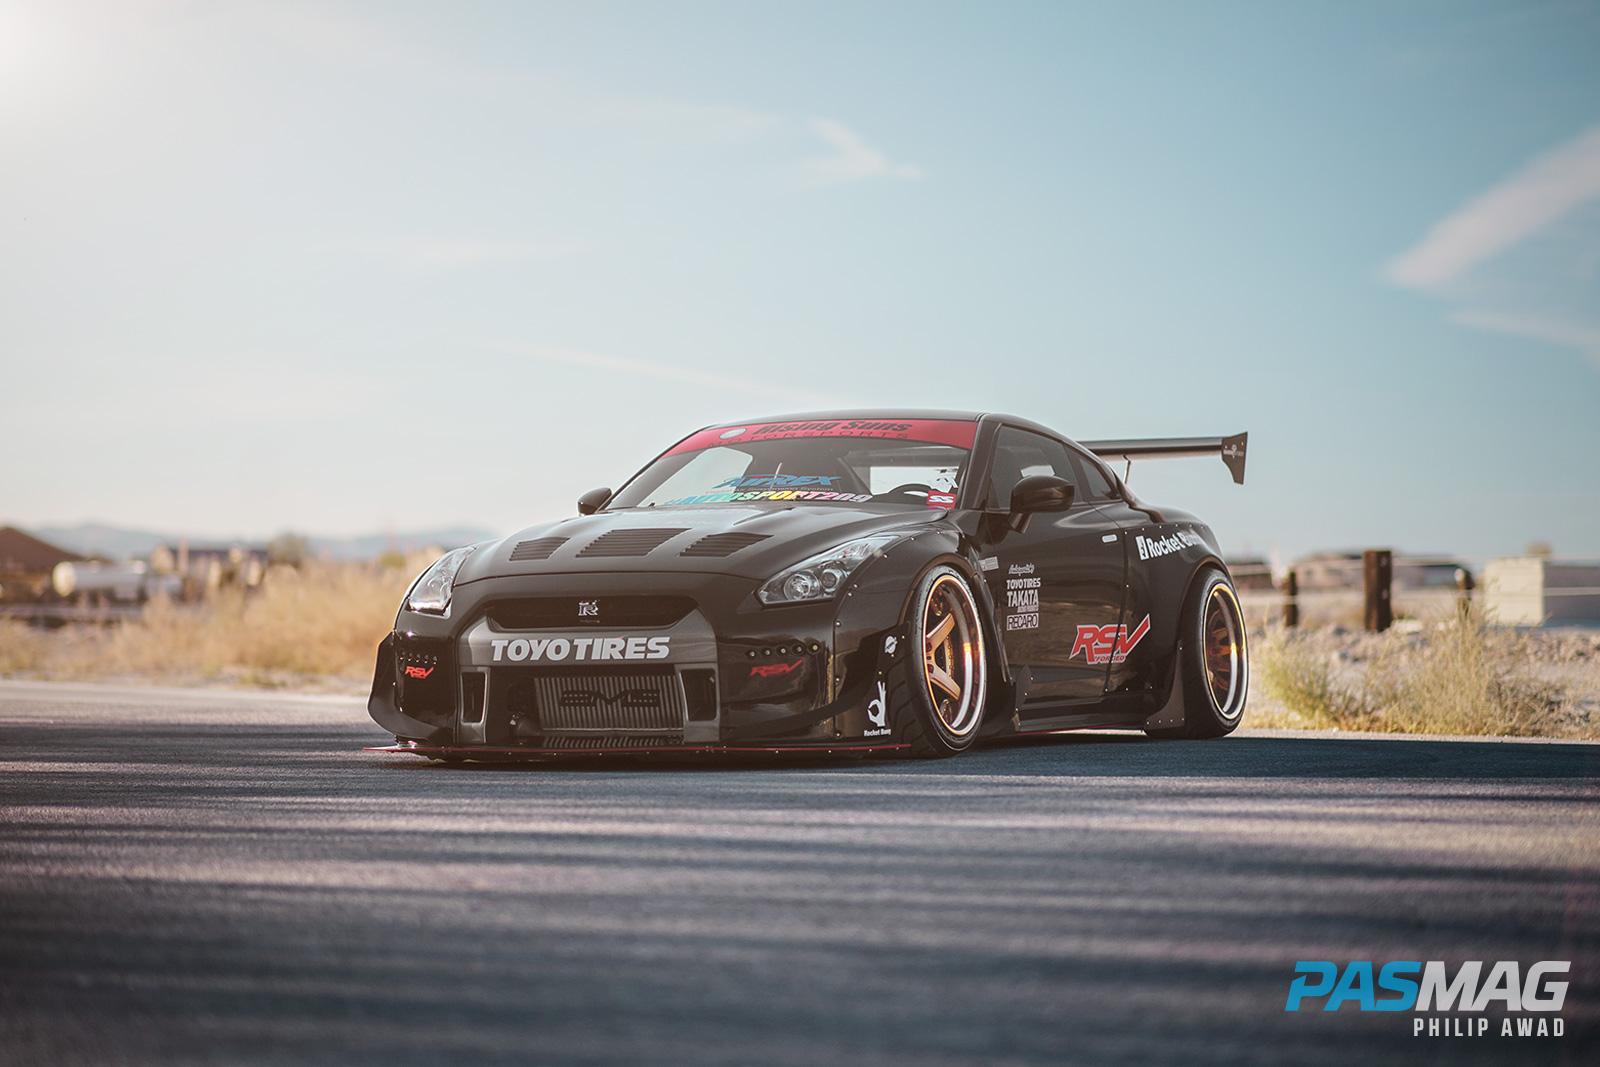 PASMAG Feature: Rothsen's Seibon Carbon x Rocket Bunny 2010 Nissan GTR